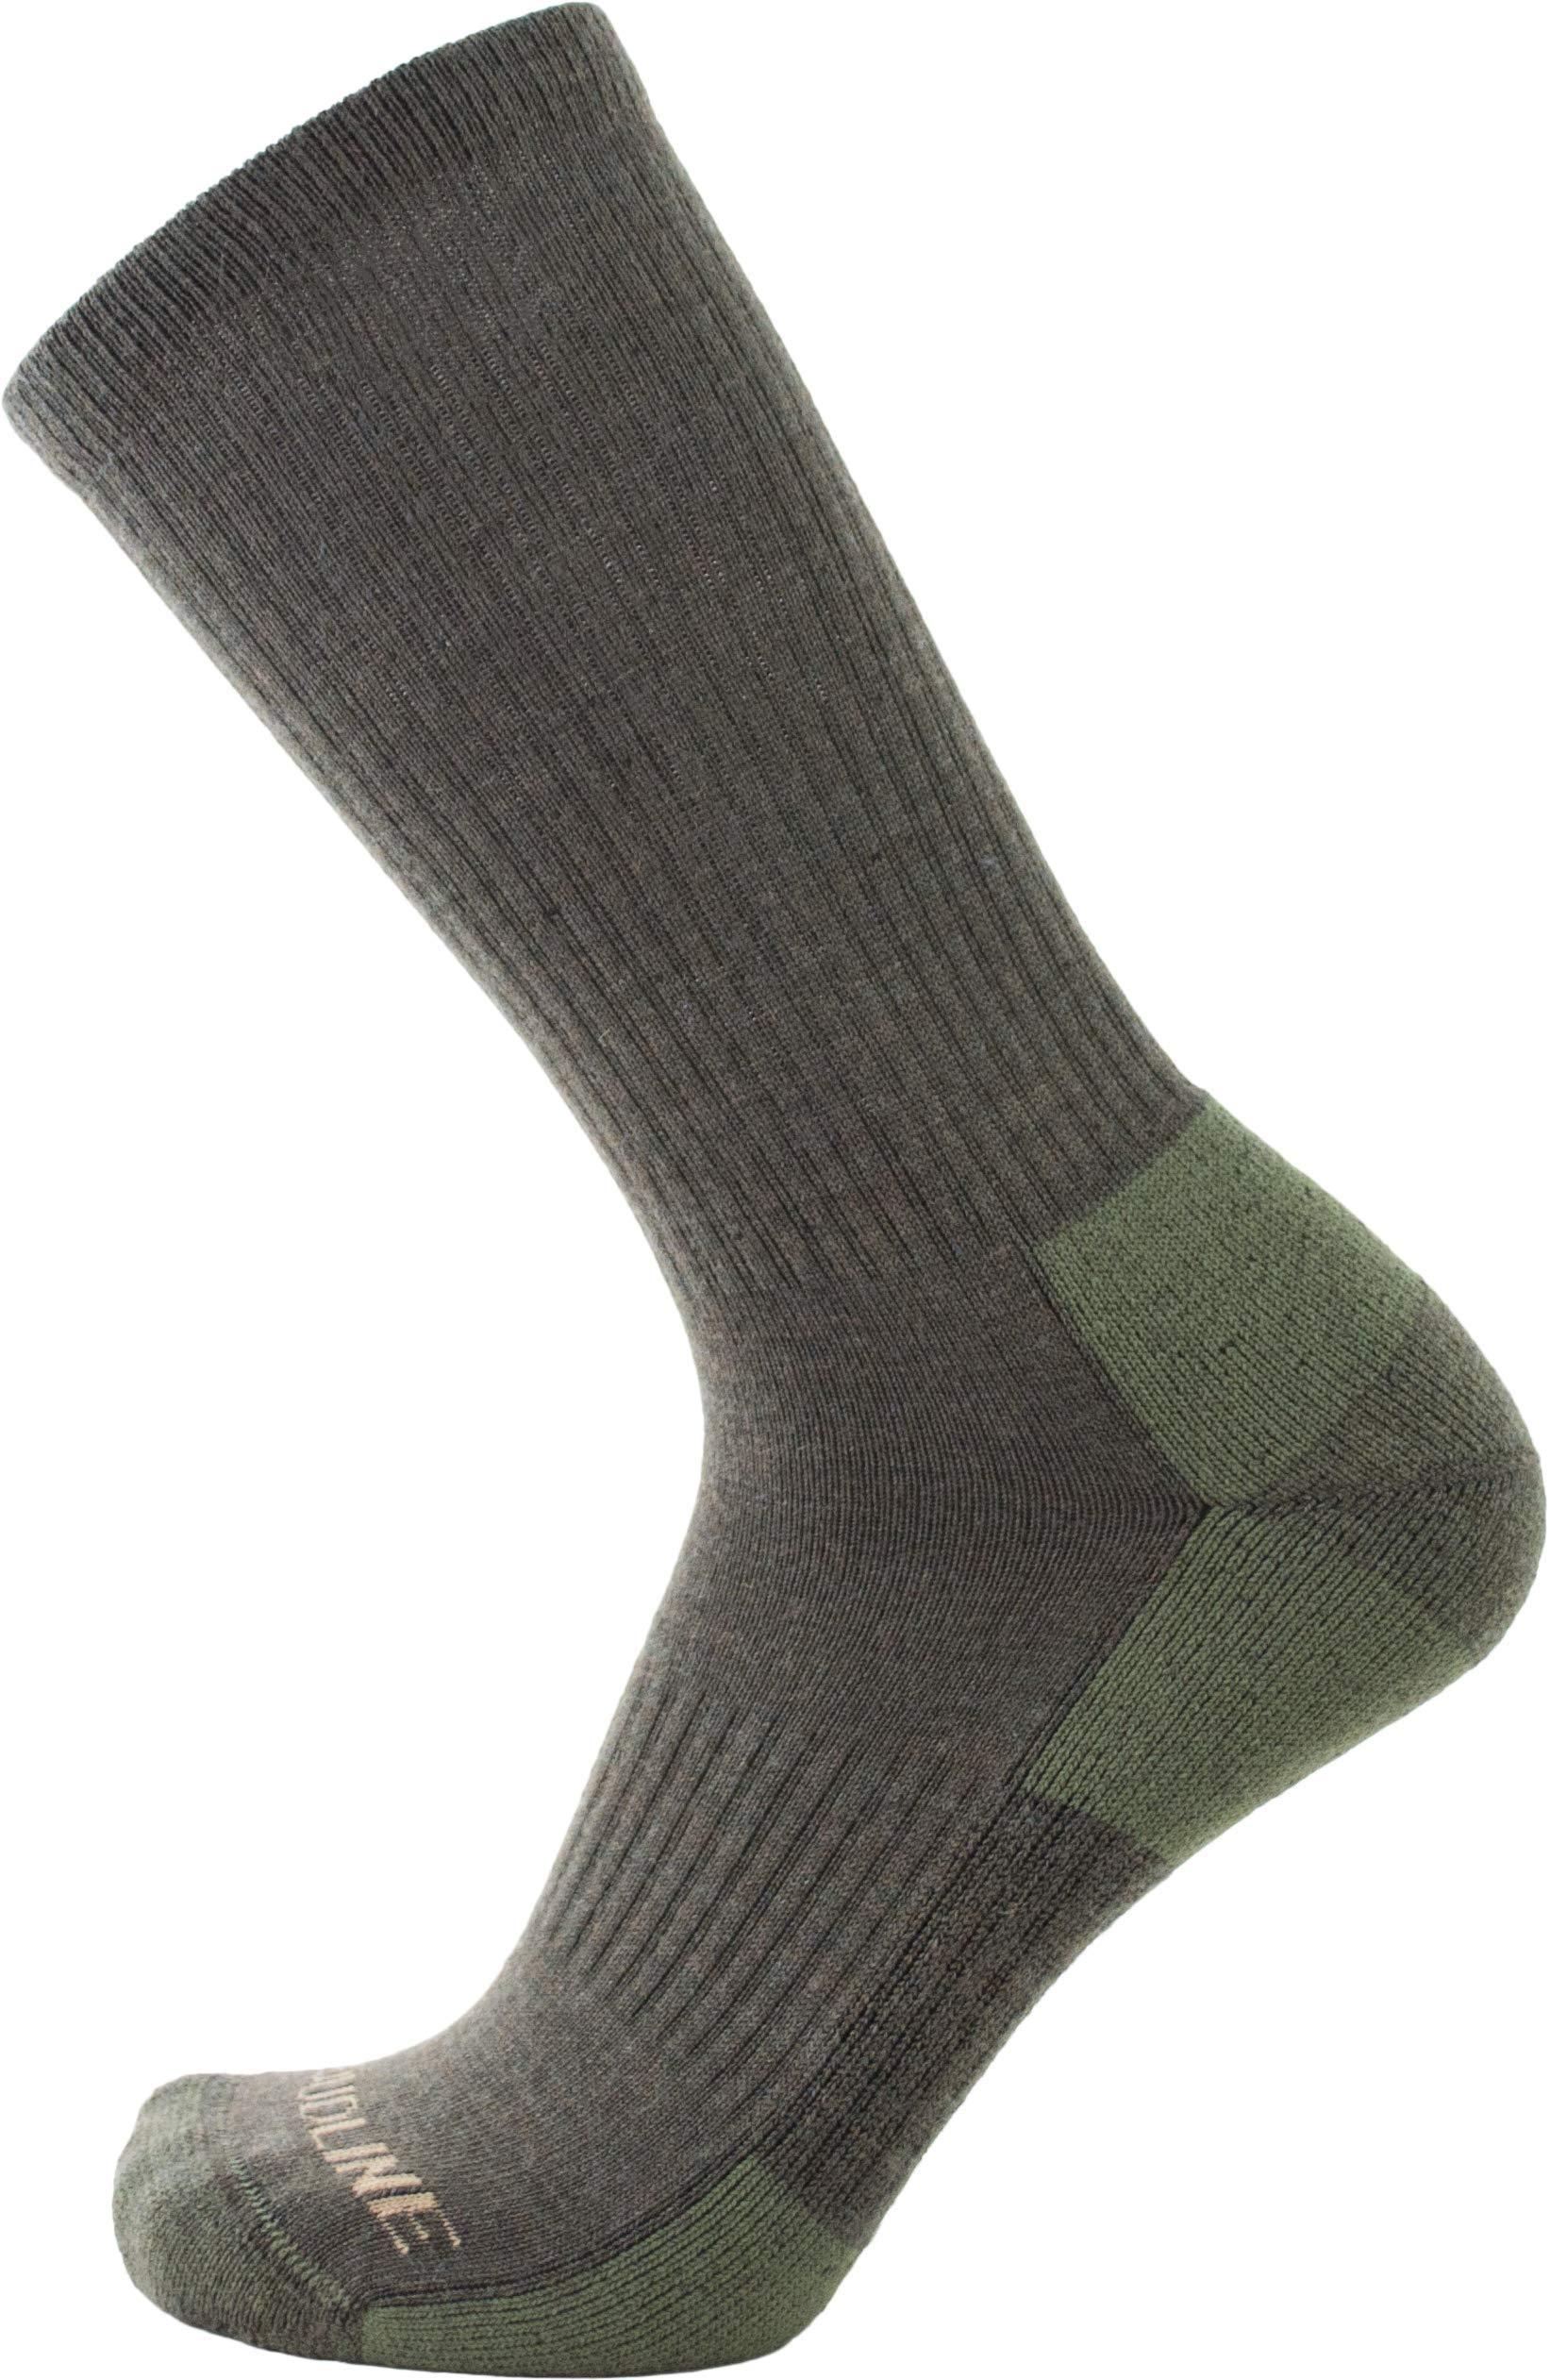 CloudLine Merino Wool Tactical Military Hiking Socks - for Men & Women - Medium Green